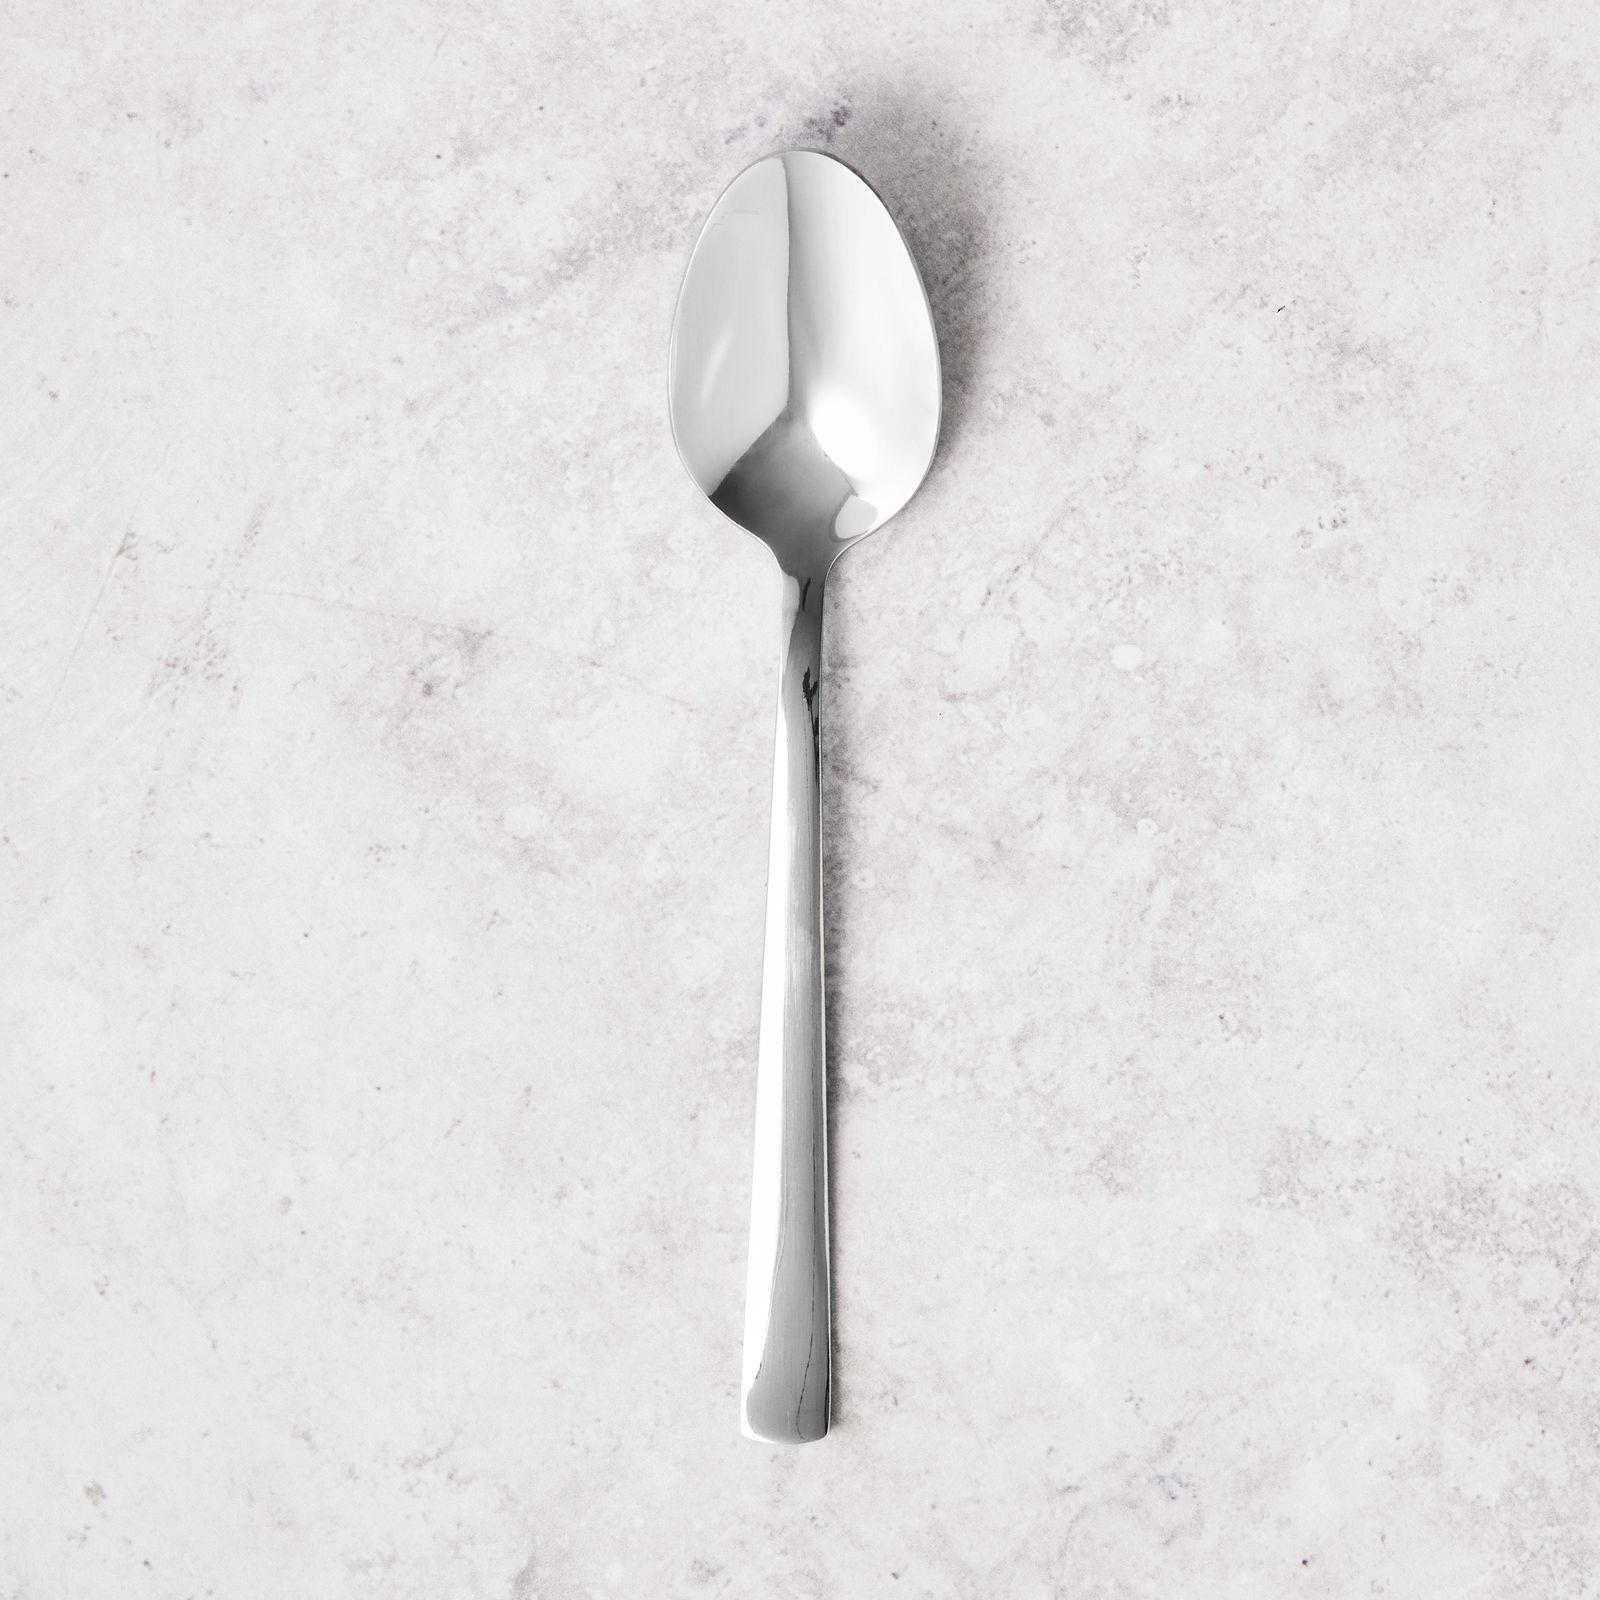 Cuillère à dessert Prato AMBITION